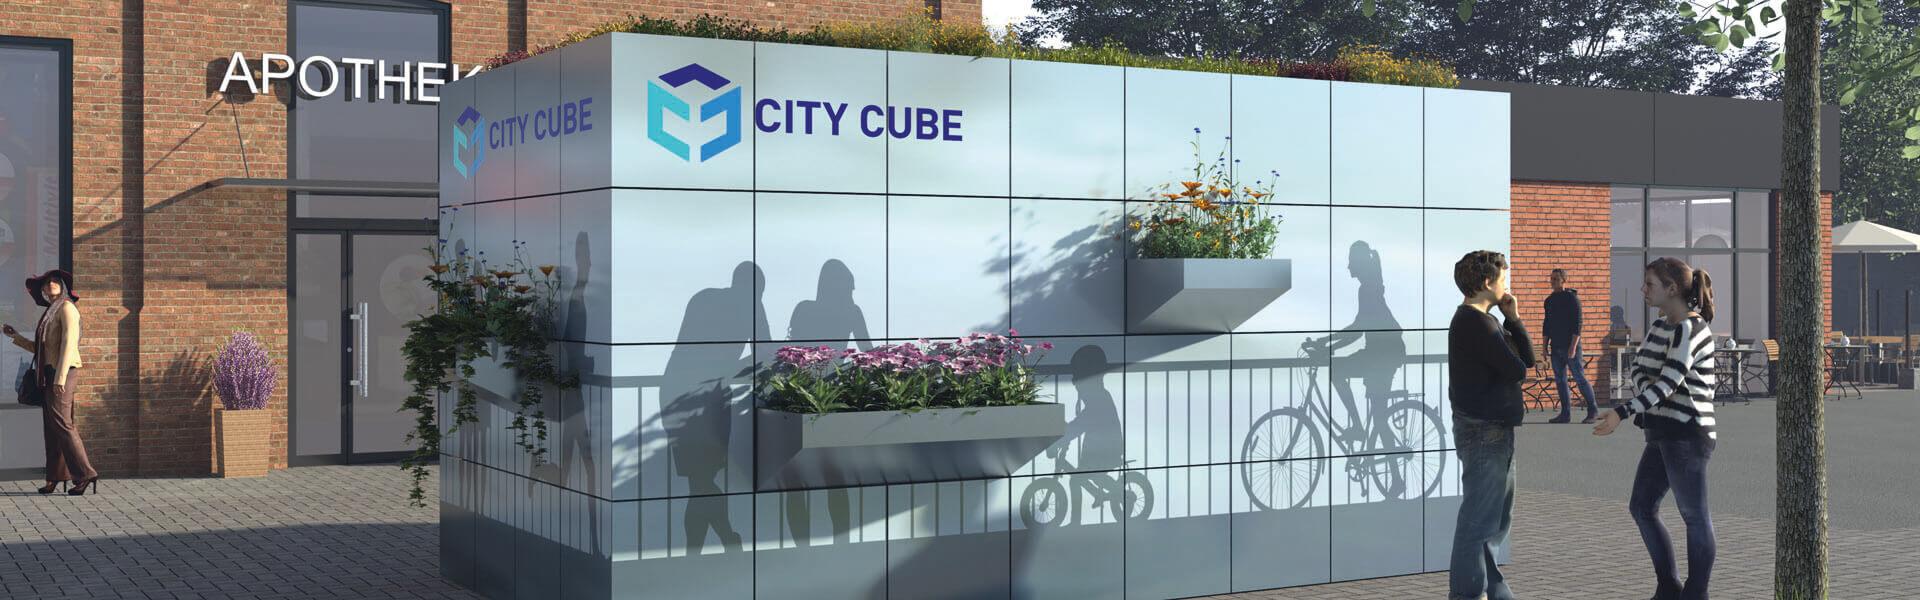 City Cube